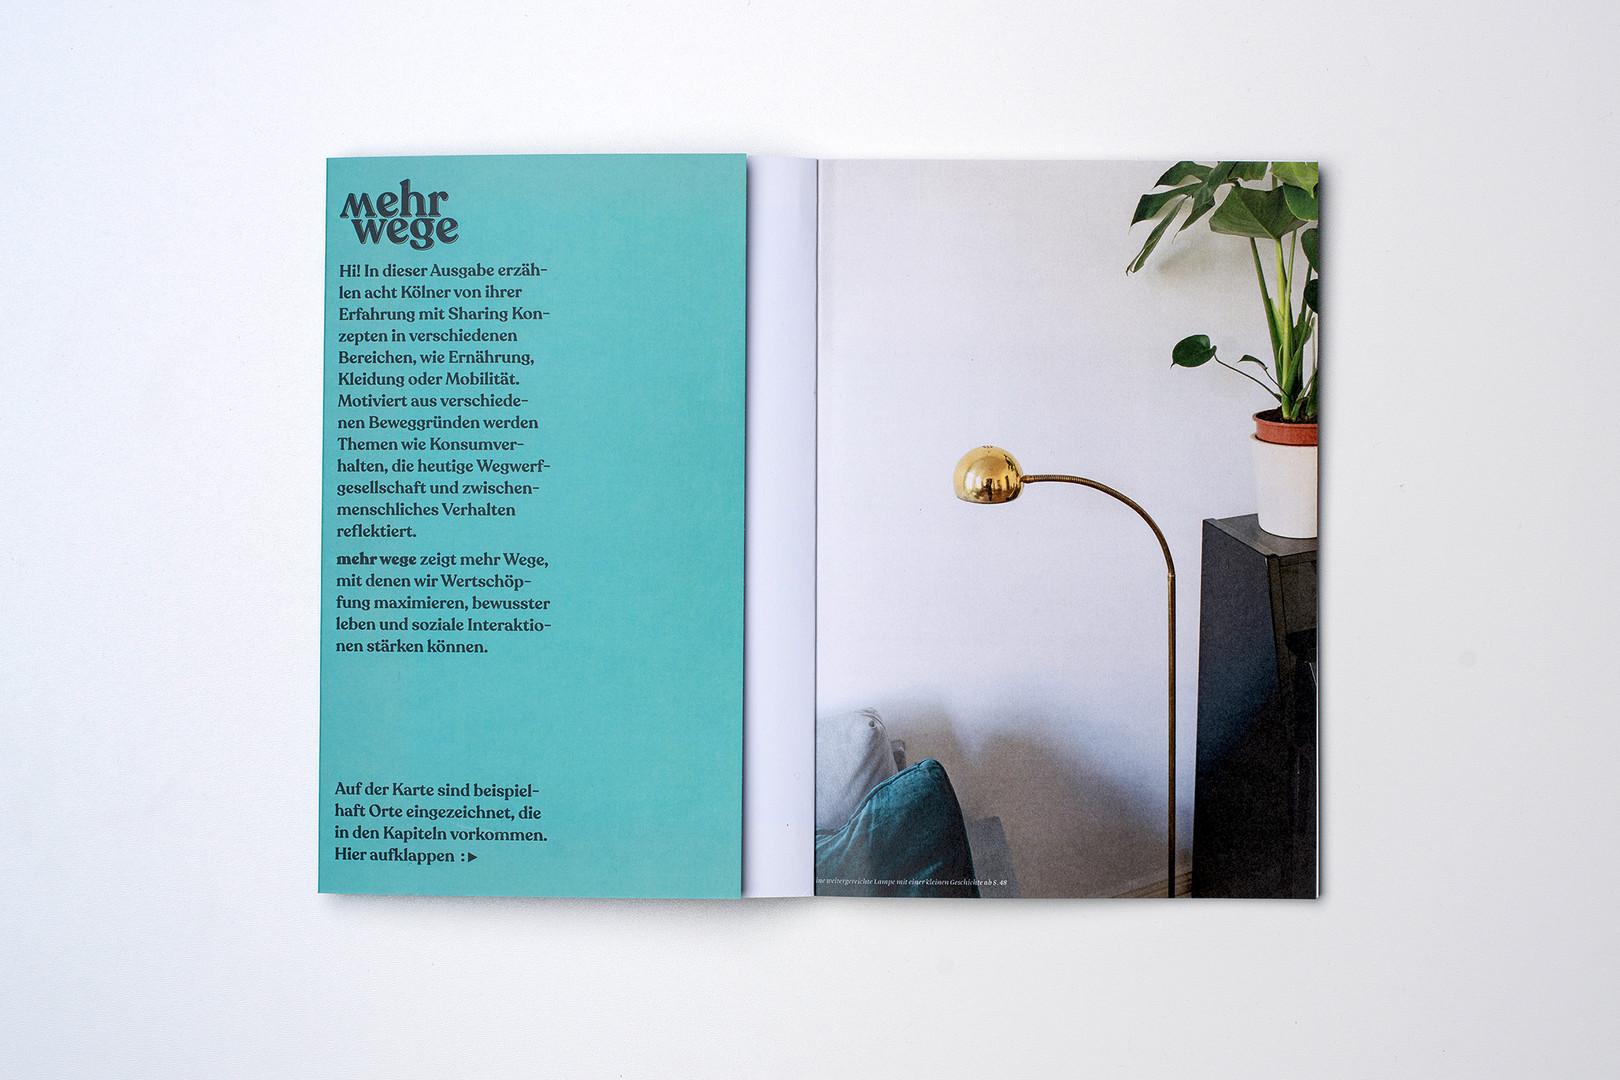 2019-02-13_magazin-mehrwege_017-4_144dpi